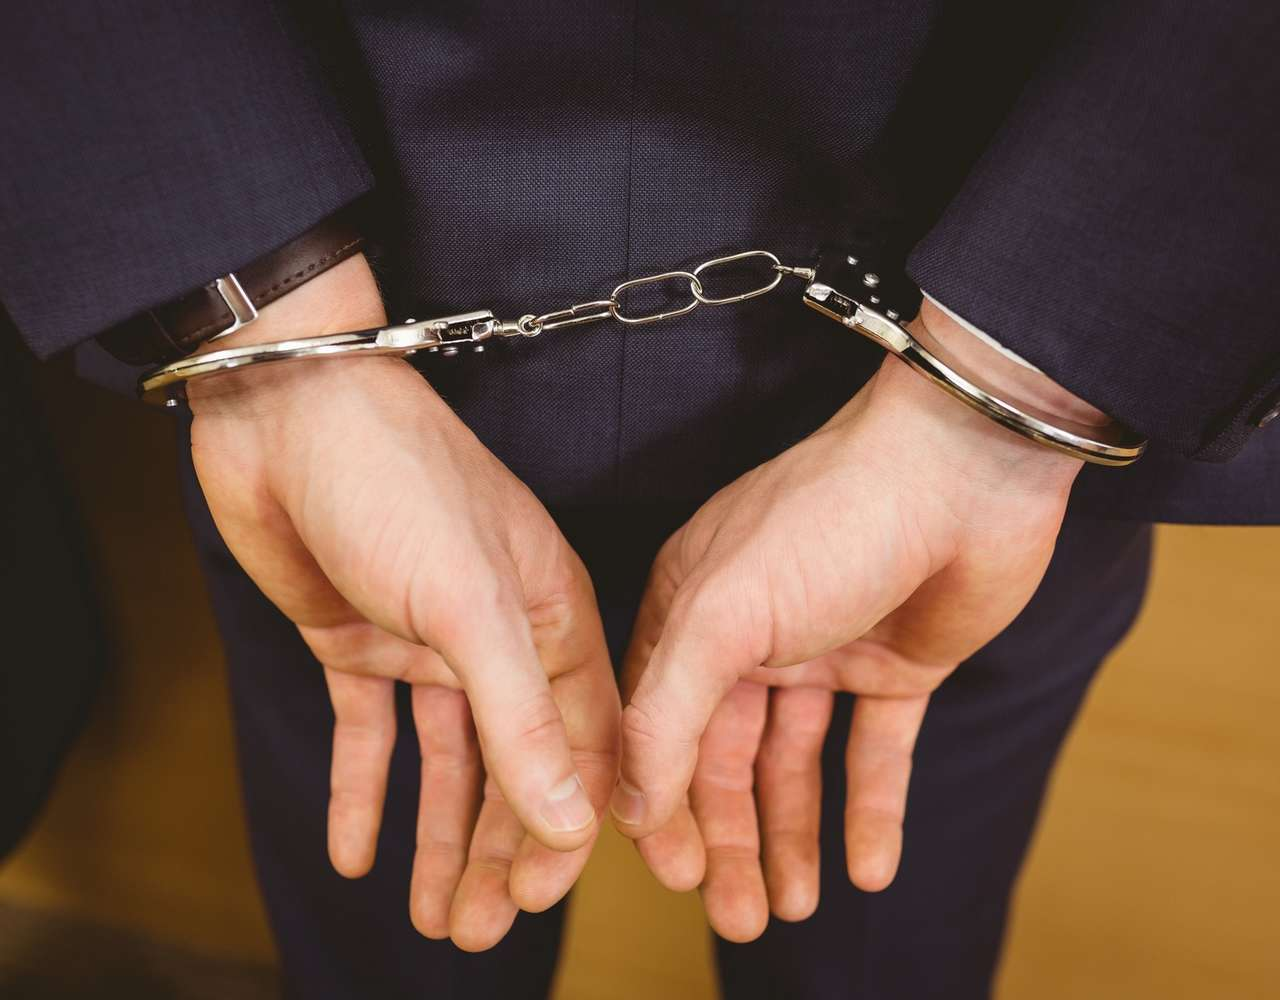 Strafrecht-Tarneden-Rechtsanwalt-Hannover